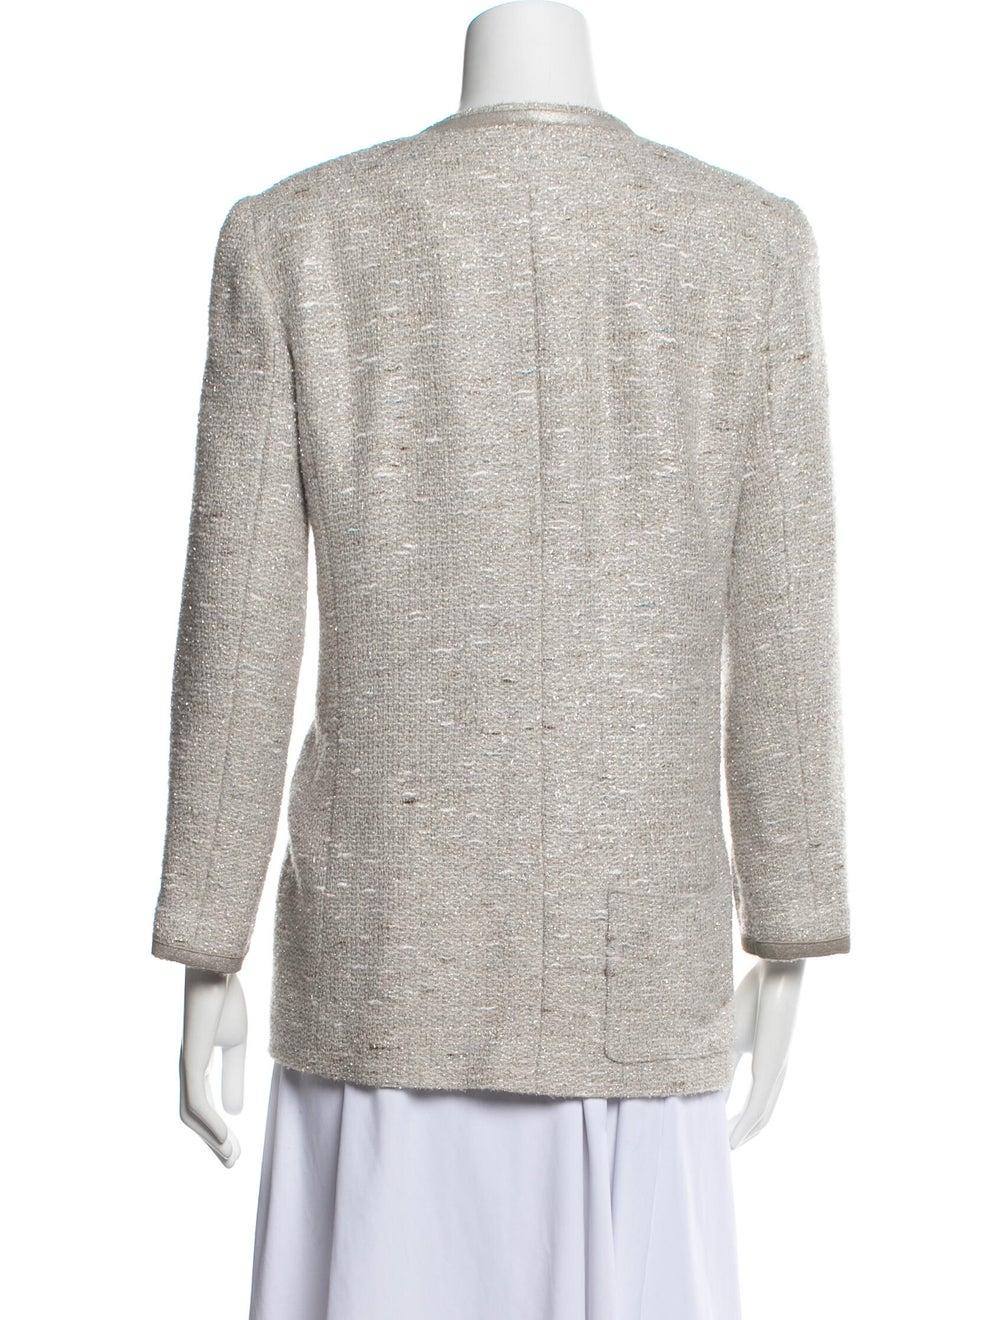 Chanel Vintage 1999 Evening Jacket Grey - image 3